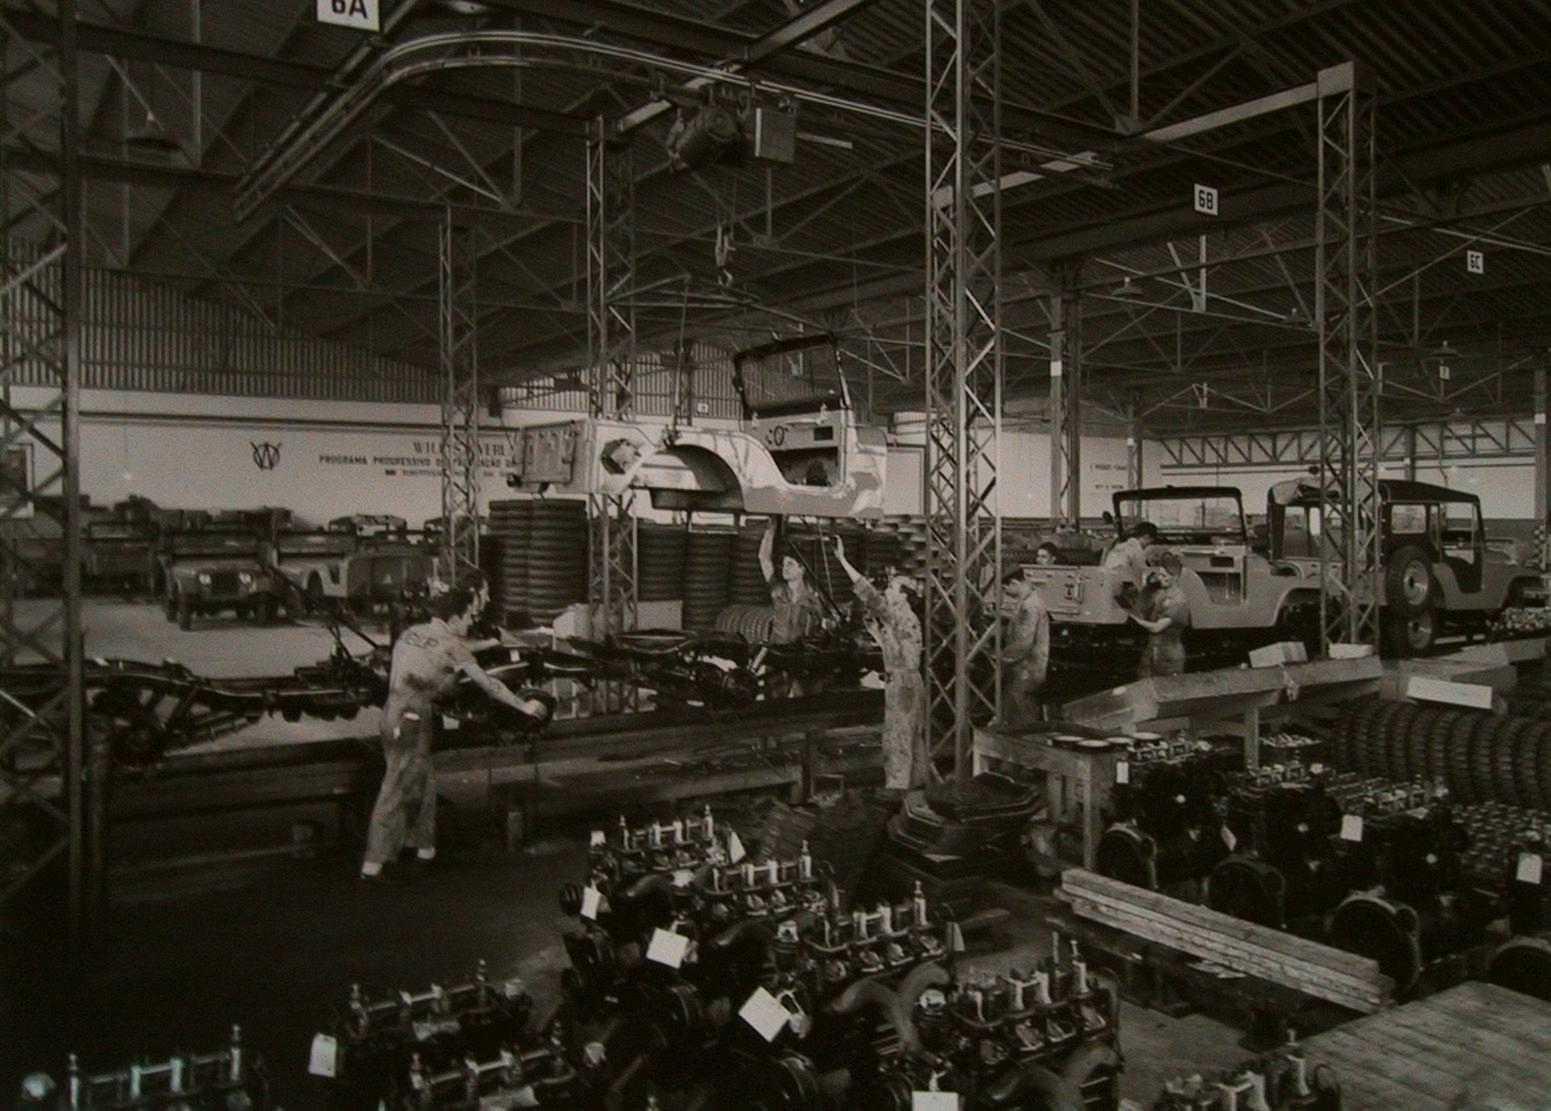 willys overland 1957